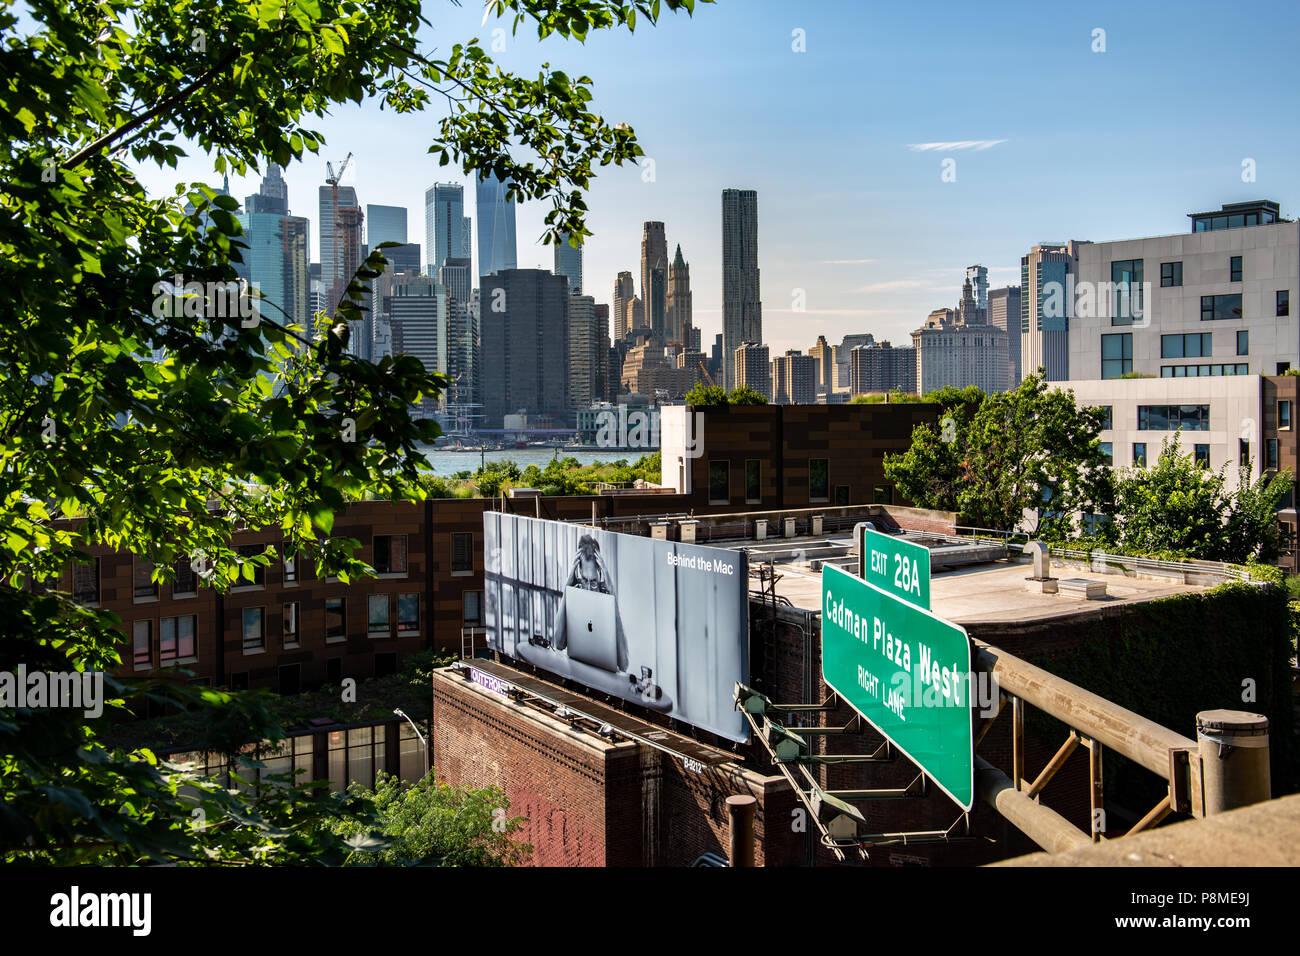 New York, City / USA - JUL 10 2018: Lower Manhattan skyline